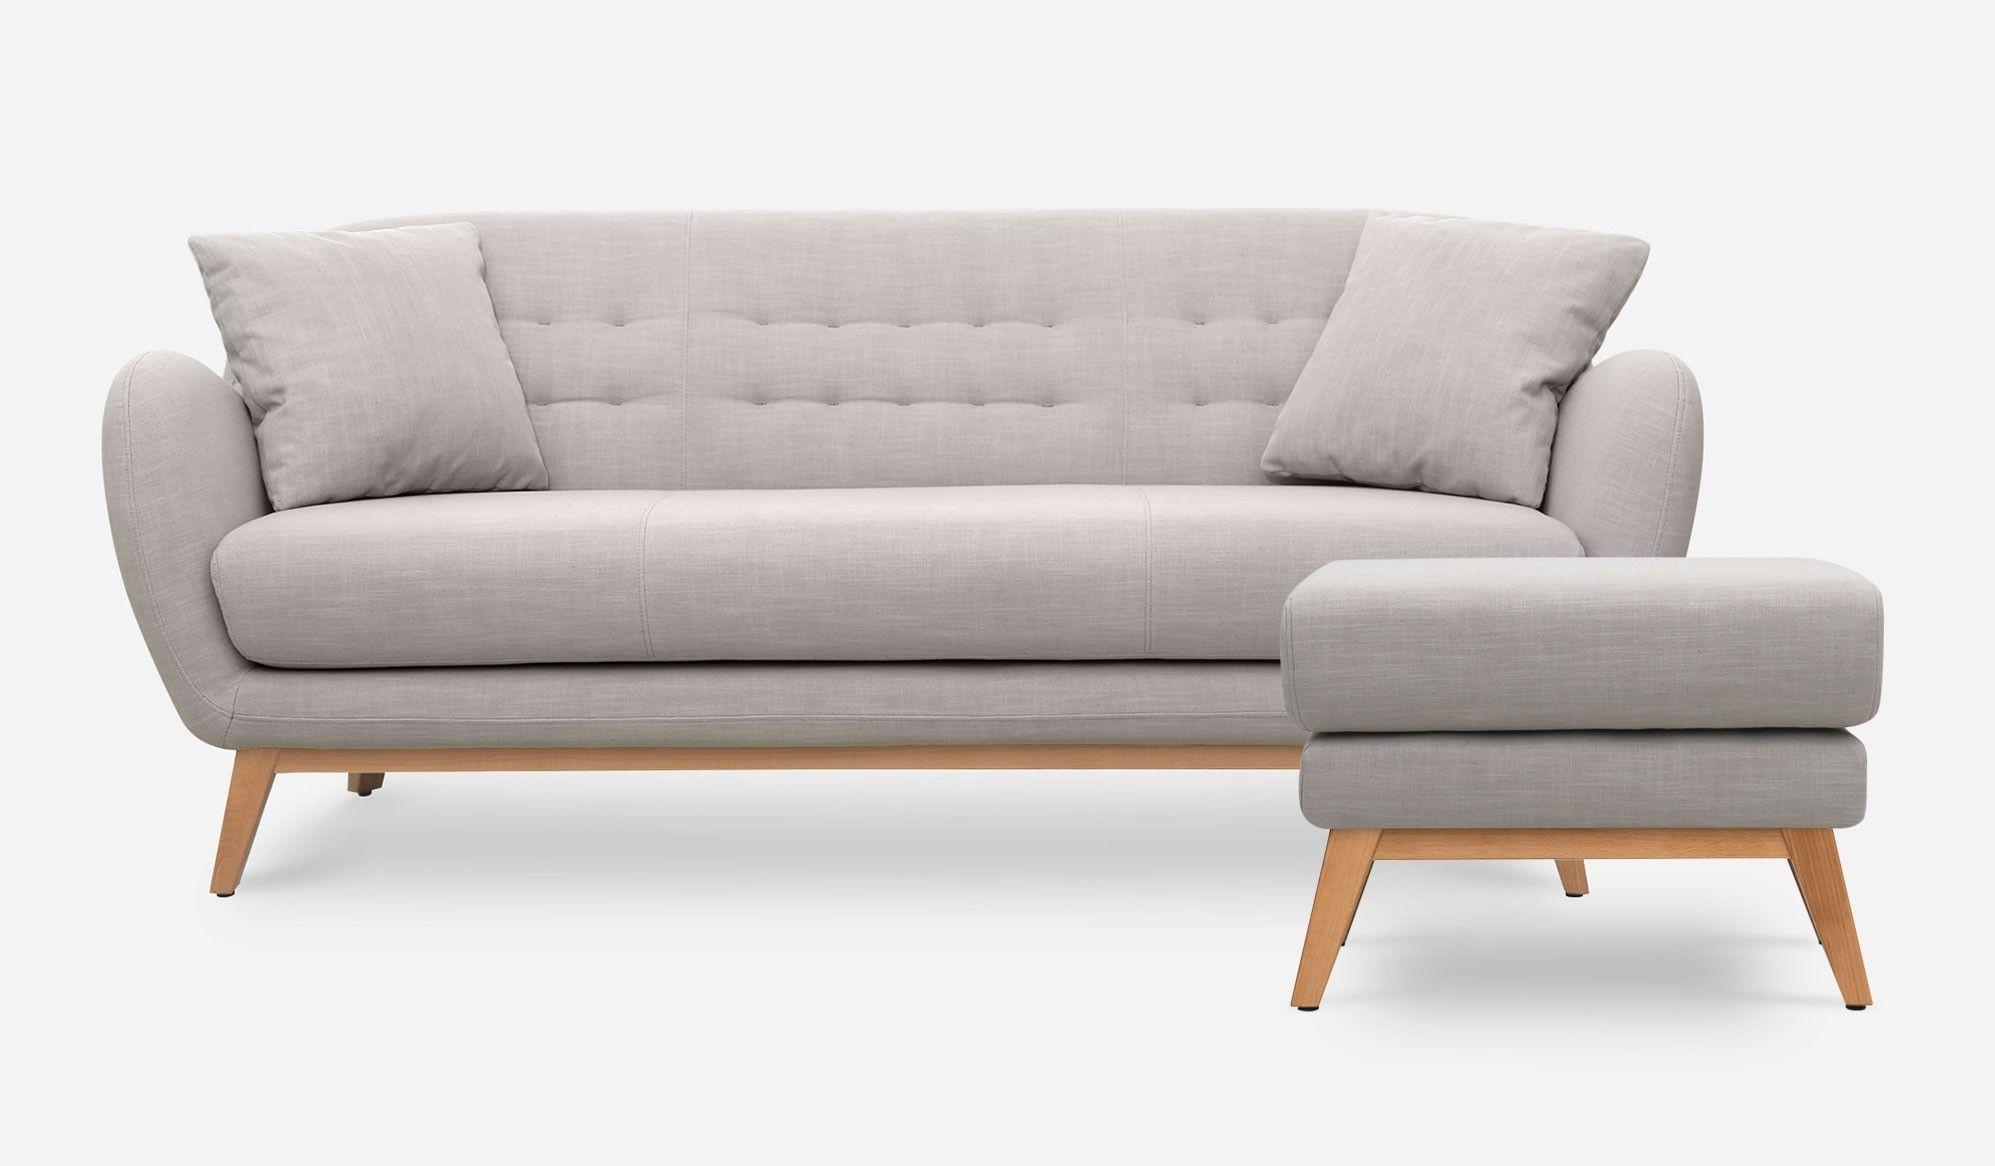 2018 Mid Century Modern Armchair Legs Wooden Lounger Living Room ...